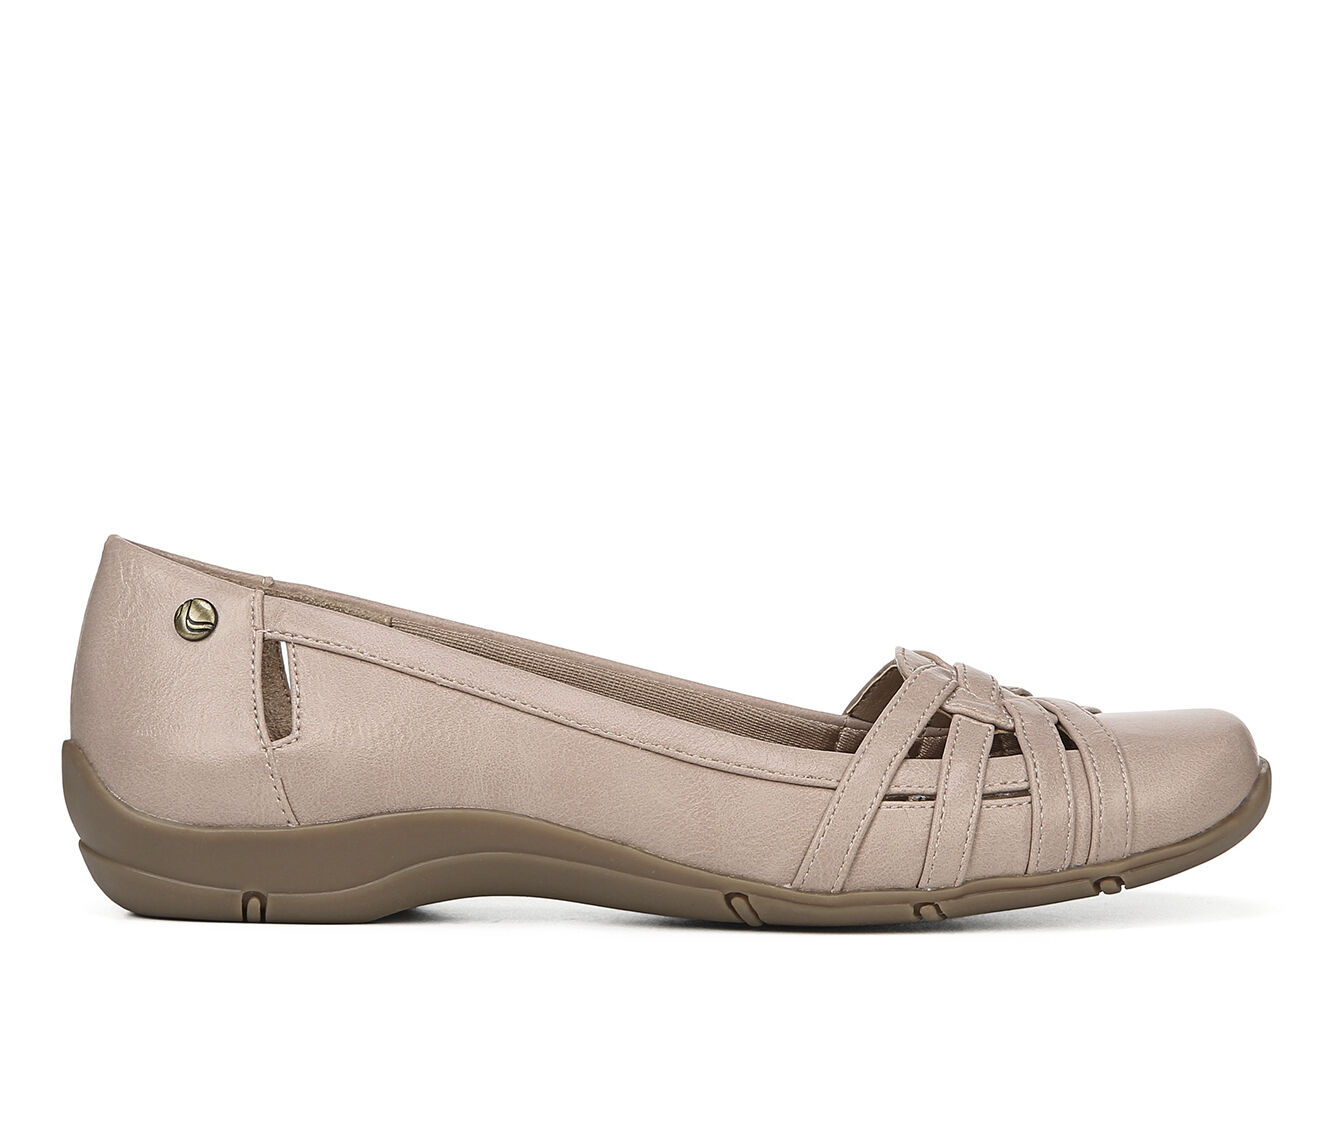 uk shoes_kd5783